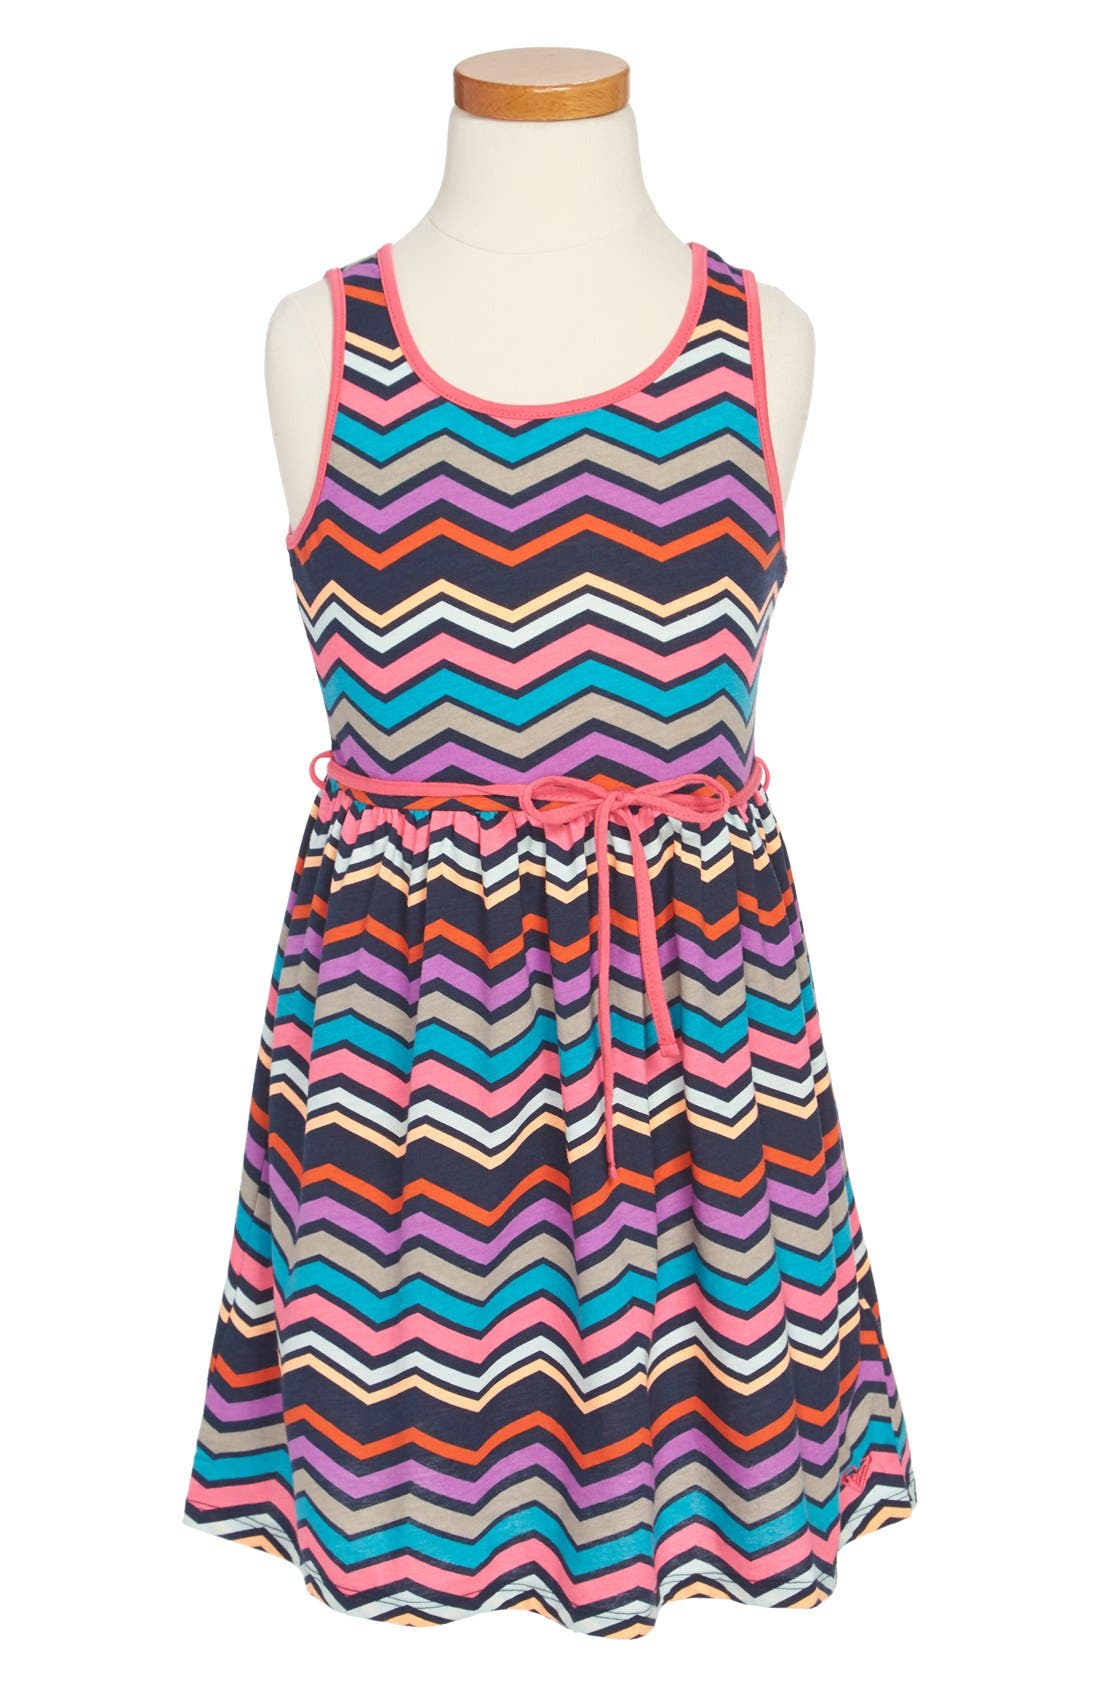 Main Image - Roxy 'Sweltering Heart' Tank Dress (Little Girls & Big Girls)